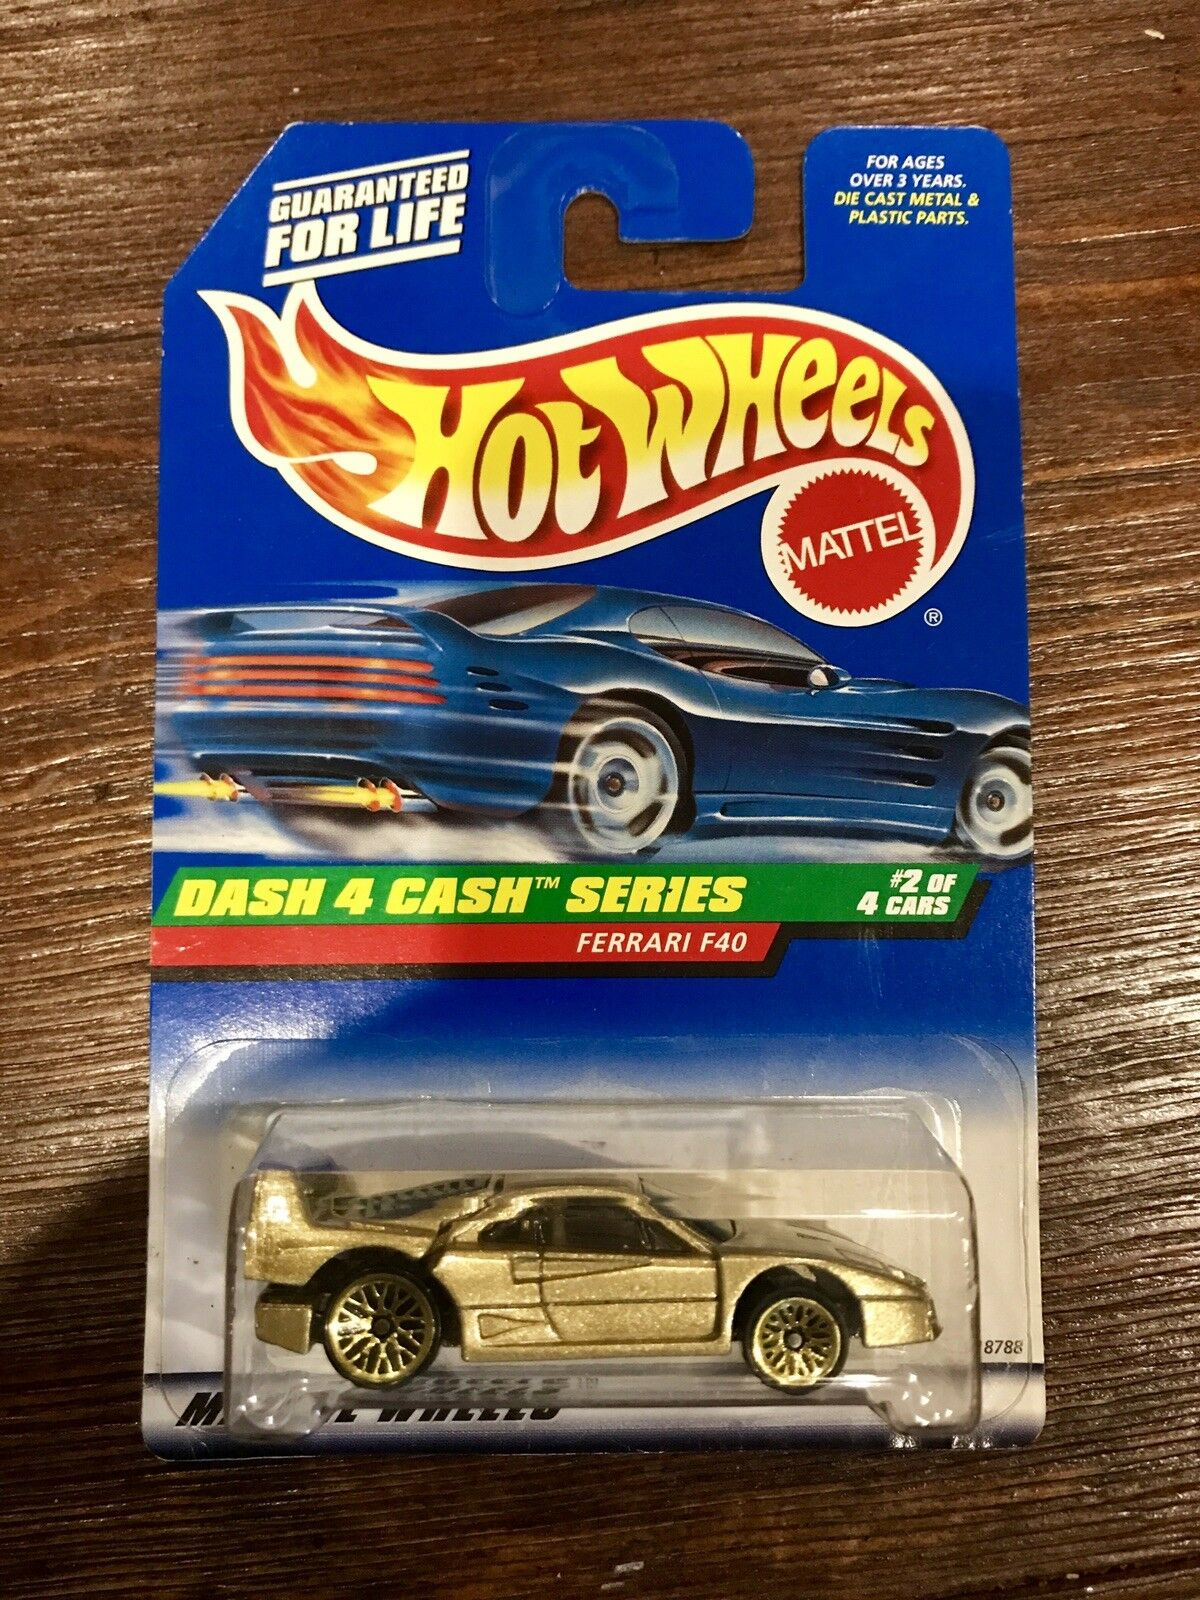 Hotwheels Ferrari F40 or Dash 4 Cash no tampos variation MATTEL RARE erreur